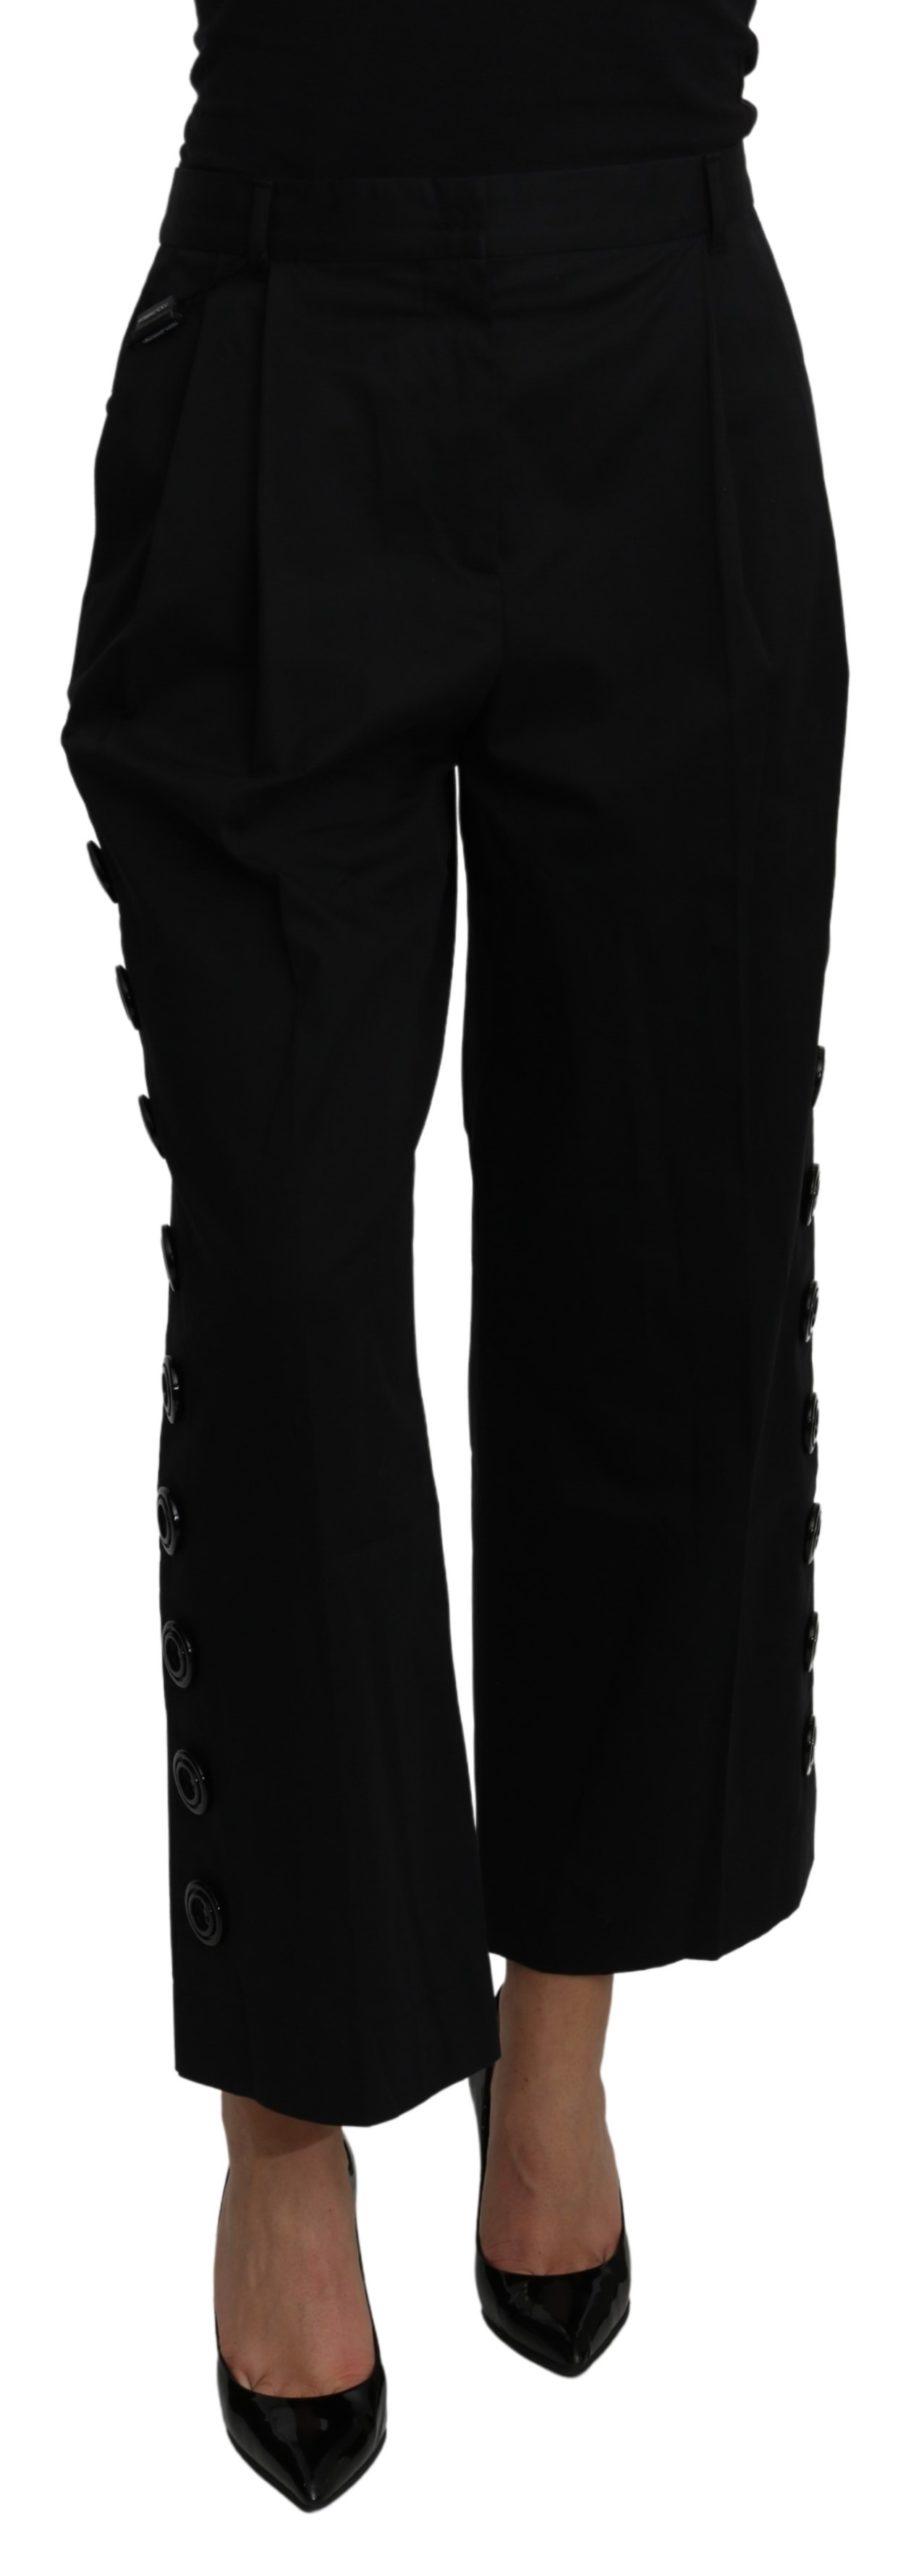 Dolce & Gabbana Women's High Waist Cotton Stretch Trouser Black PAN71215 - IT40|S